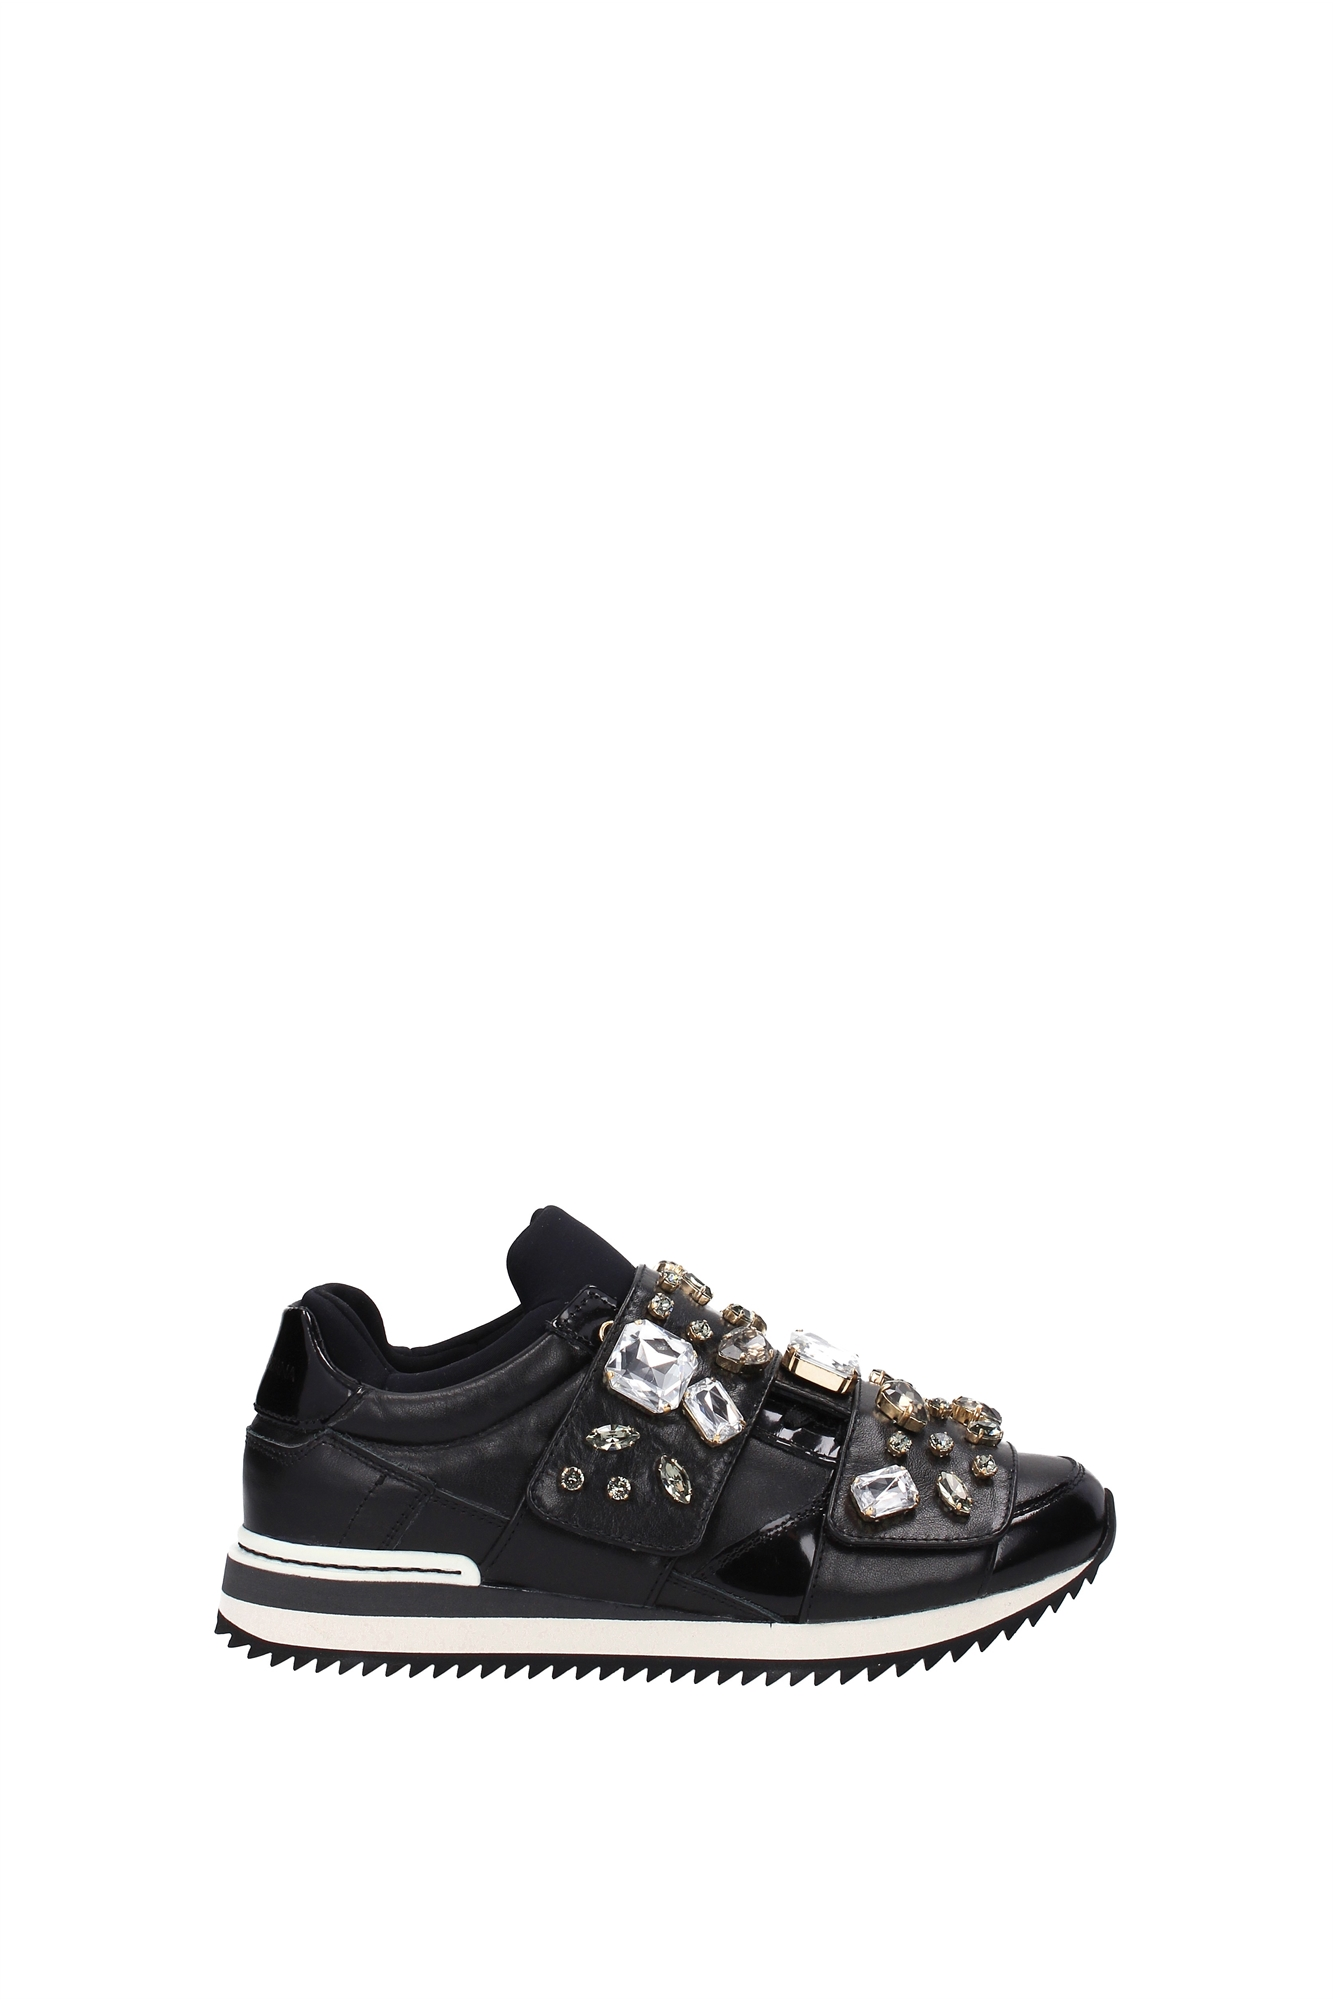 sneakers dolce gabbana women leather black ck0004al3908b956 ebay. Black Bedroom Furniture Sets. Home Design Ideas